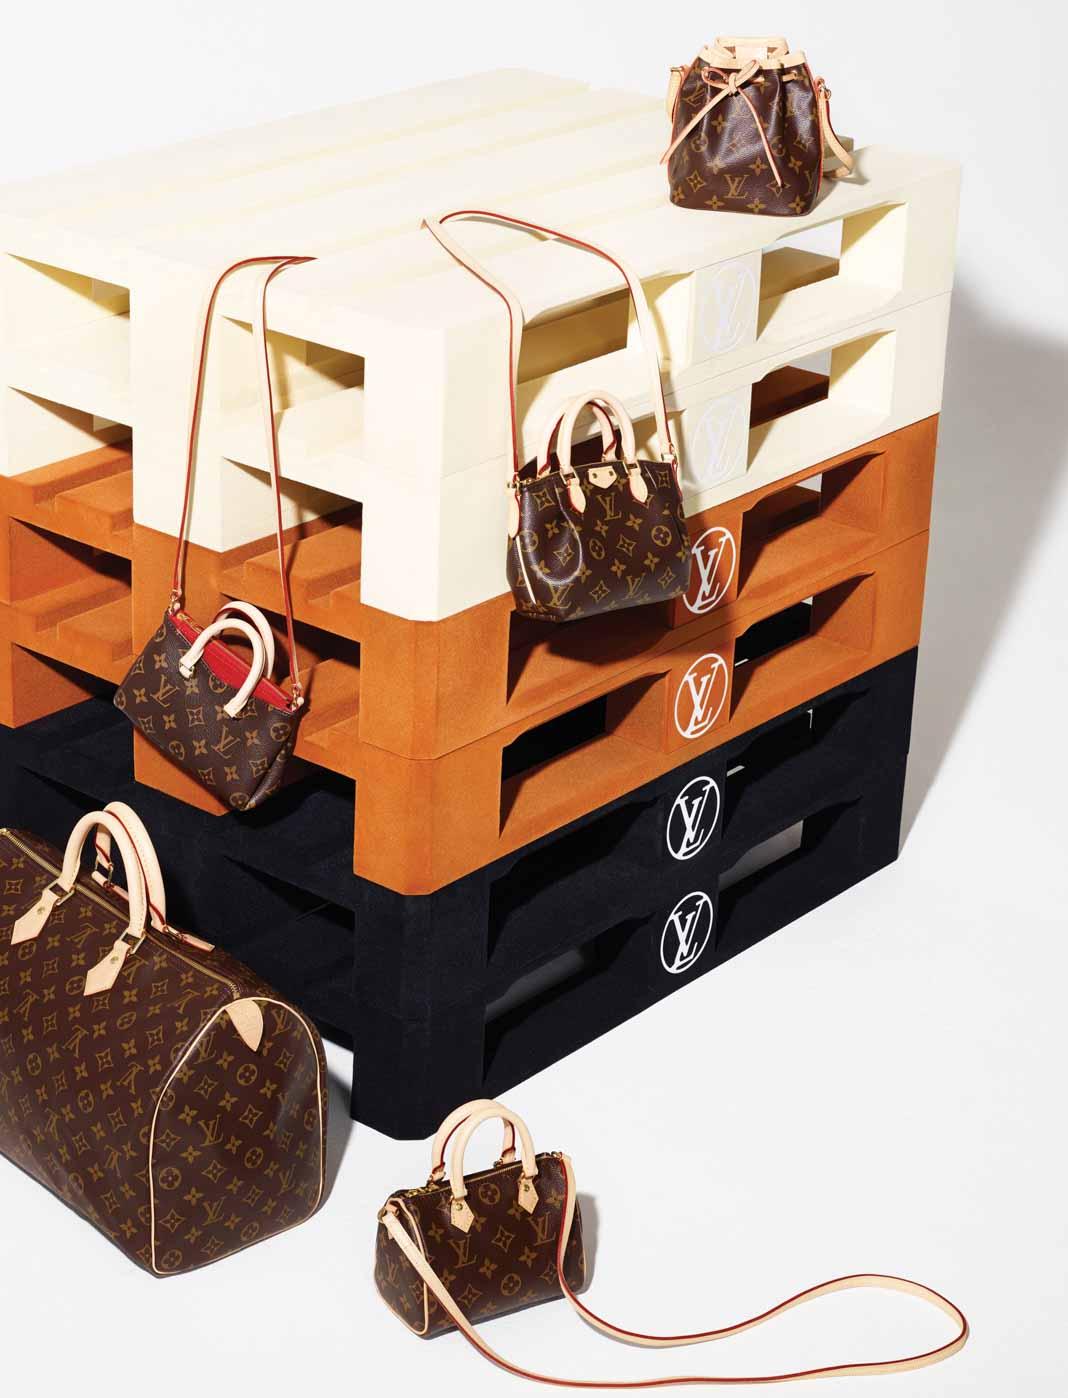 tui-nano-Louis-Vuitton-TT-619-2015-7